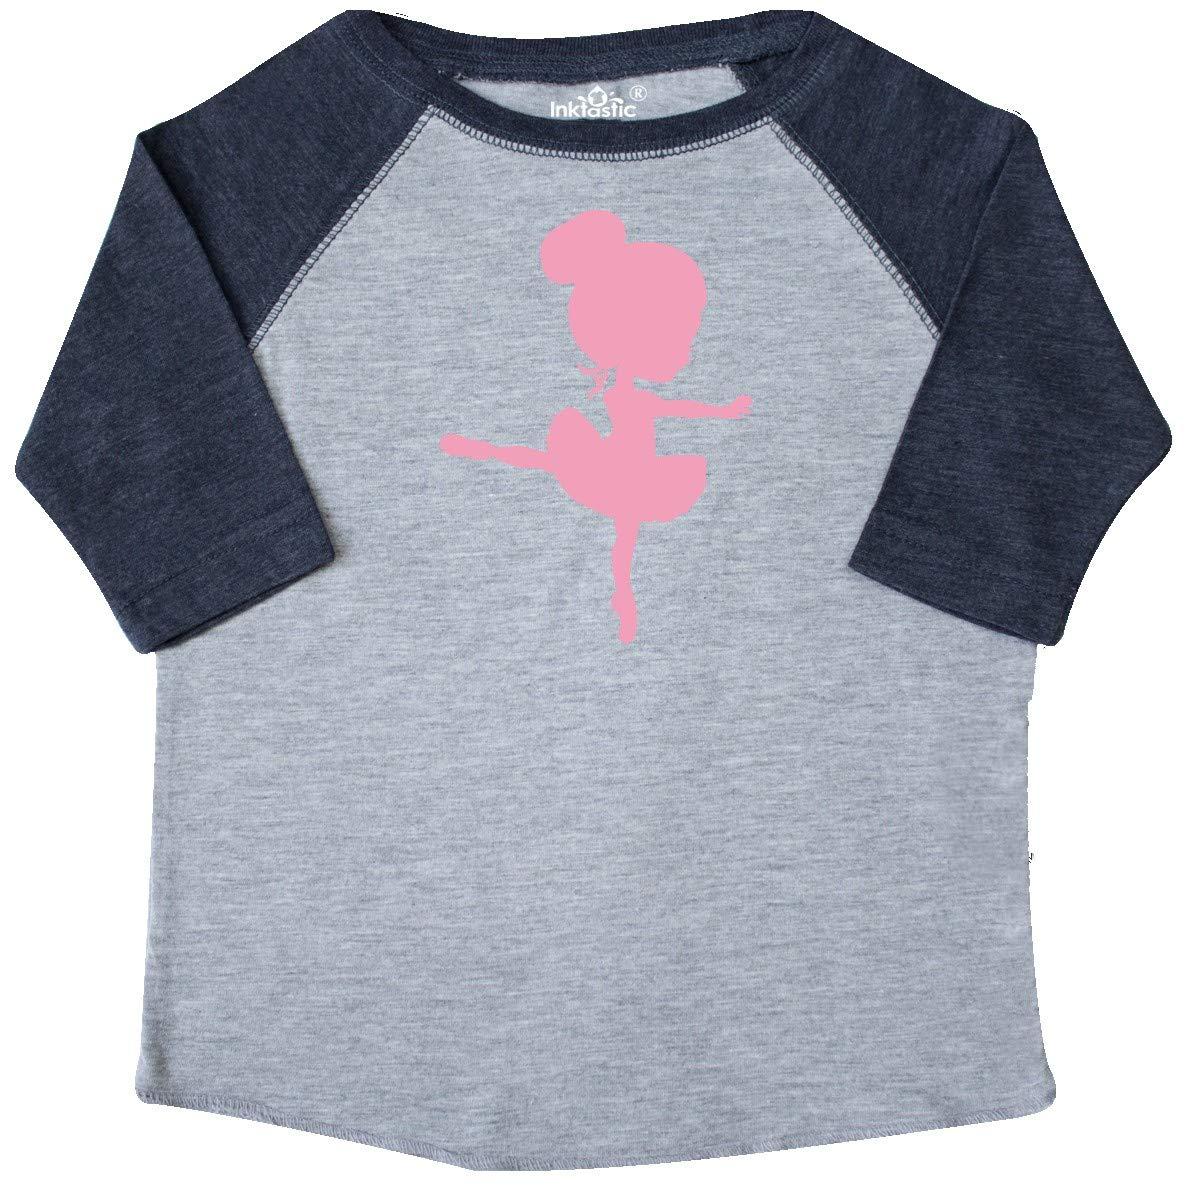 inktastic Cute Ballerina Toddler T-Shirt